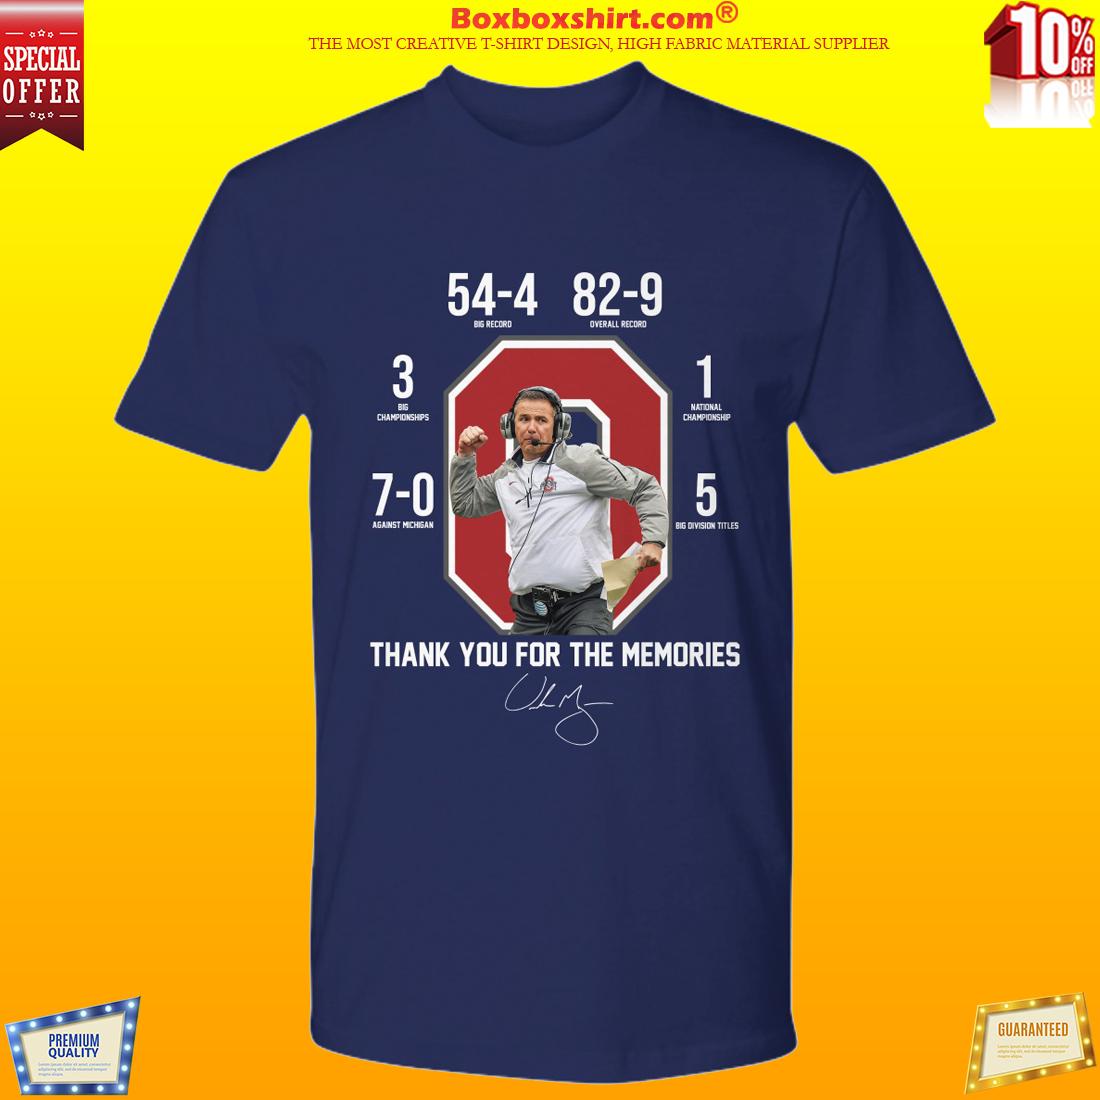 Thank for memories Urban Meyer shirt